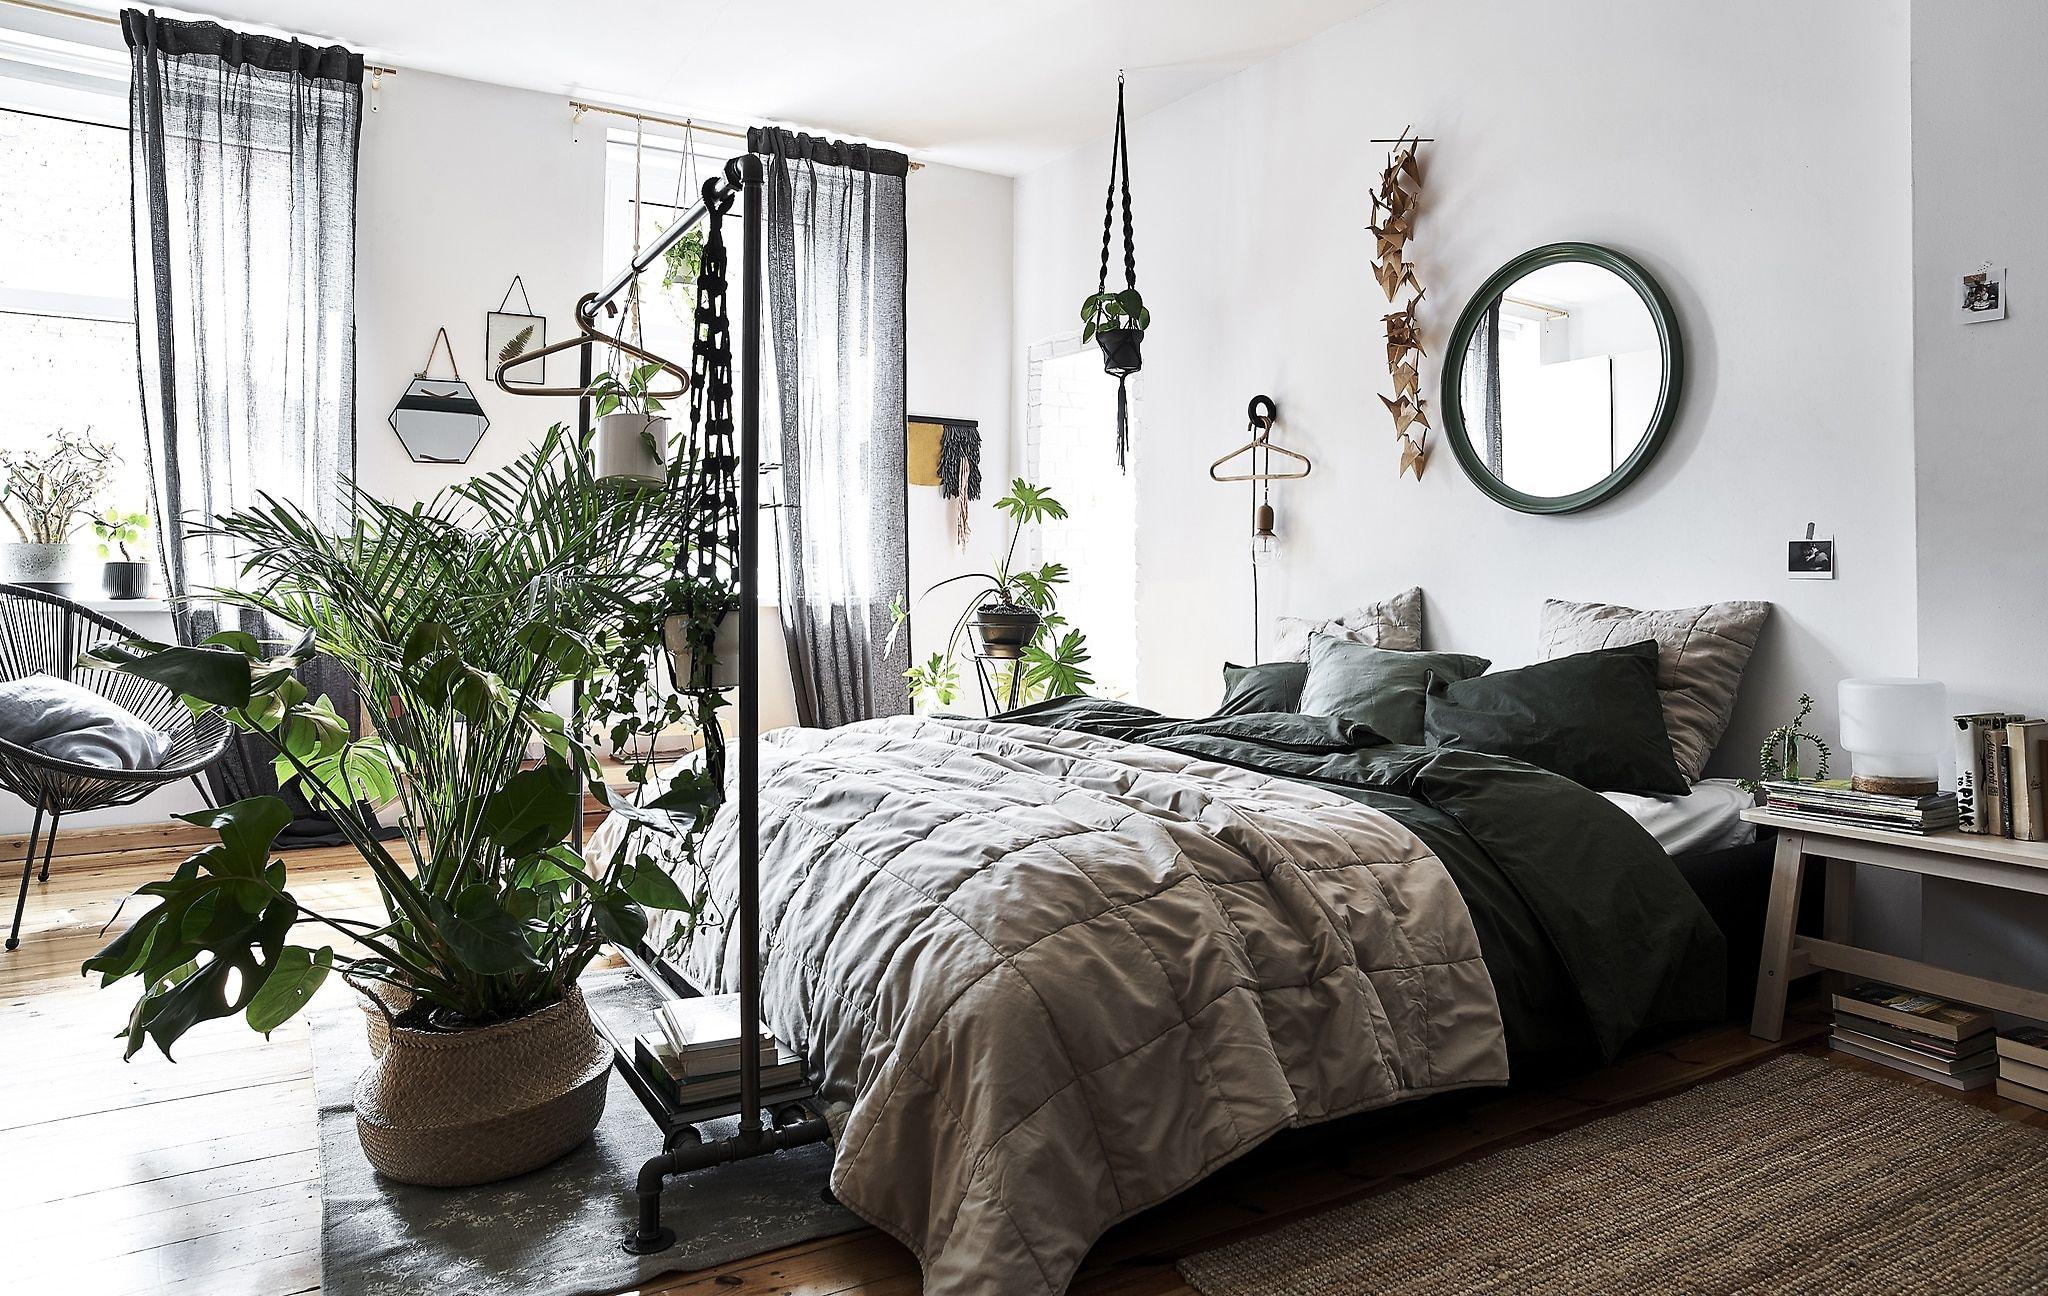 Image result for ikea bedroom ideas Relaxing bedroom